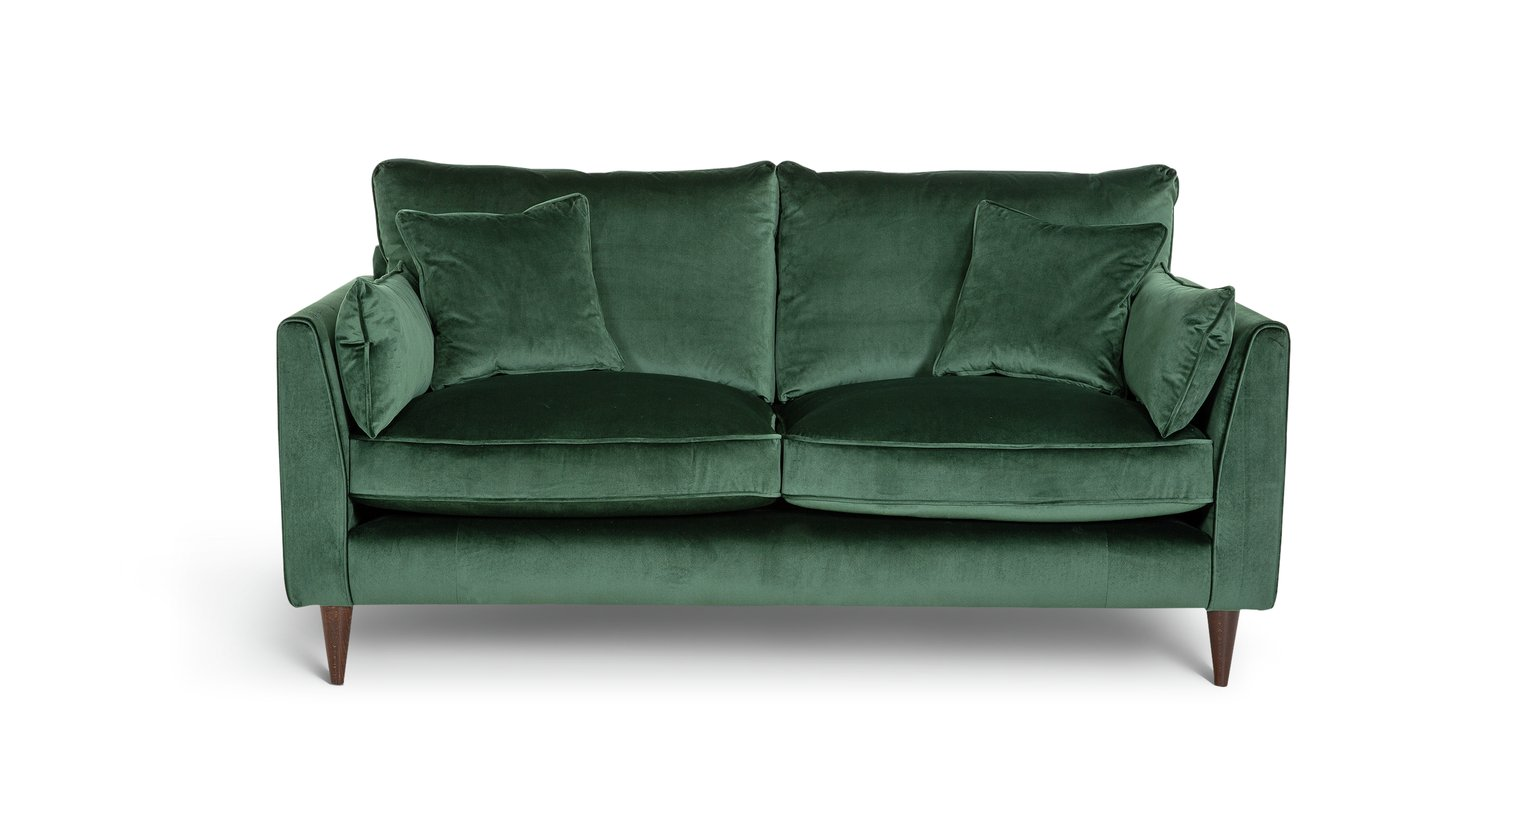 Argos Home Hector 2 Seater Velvet Sofa review